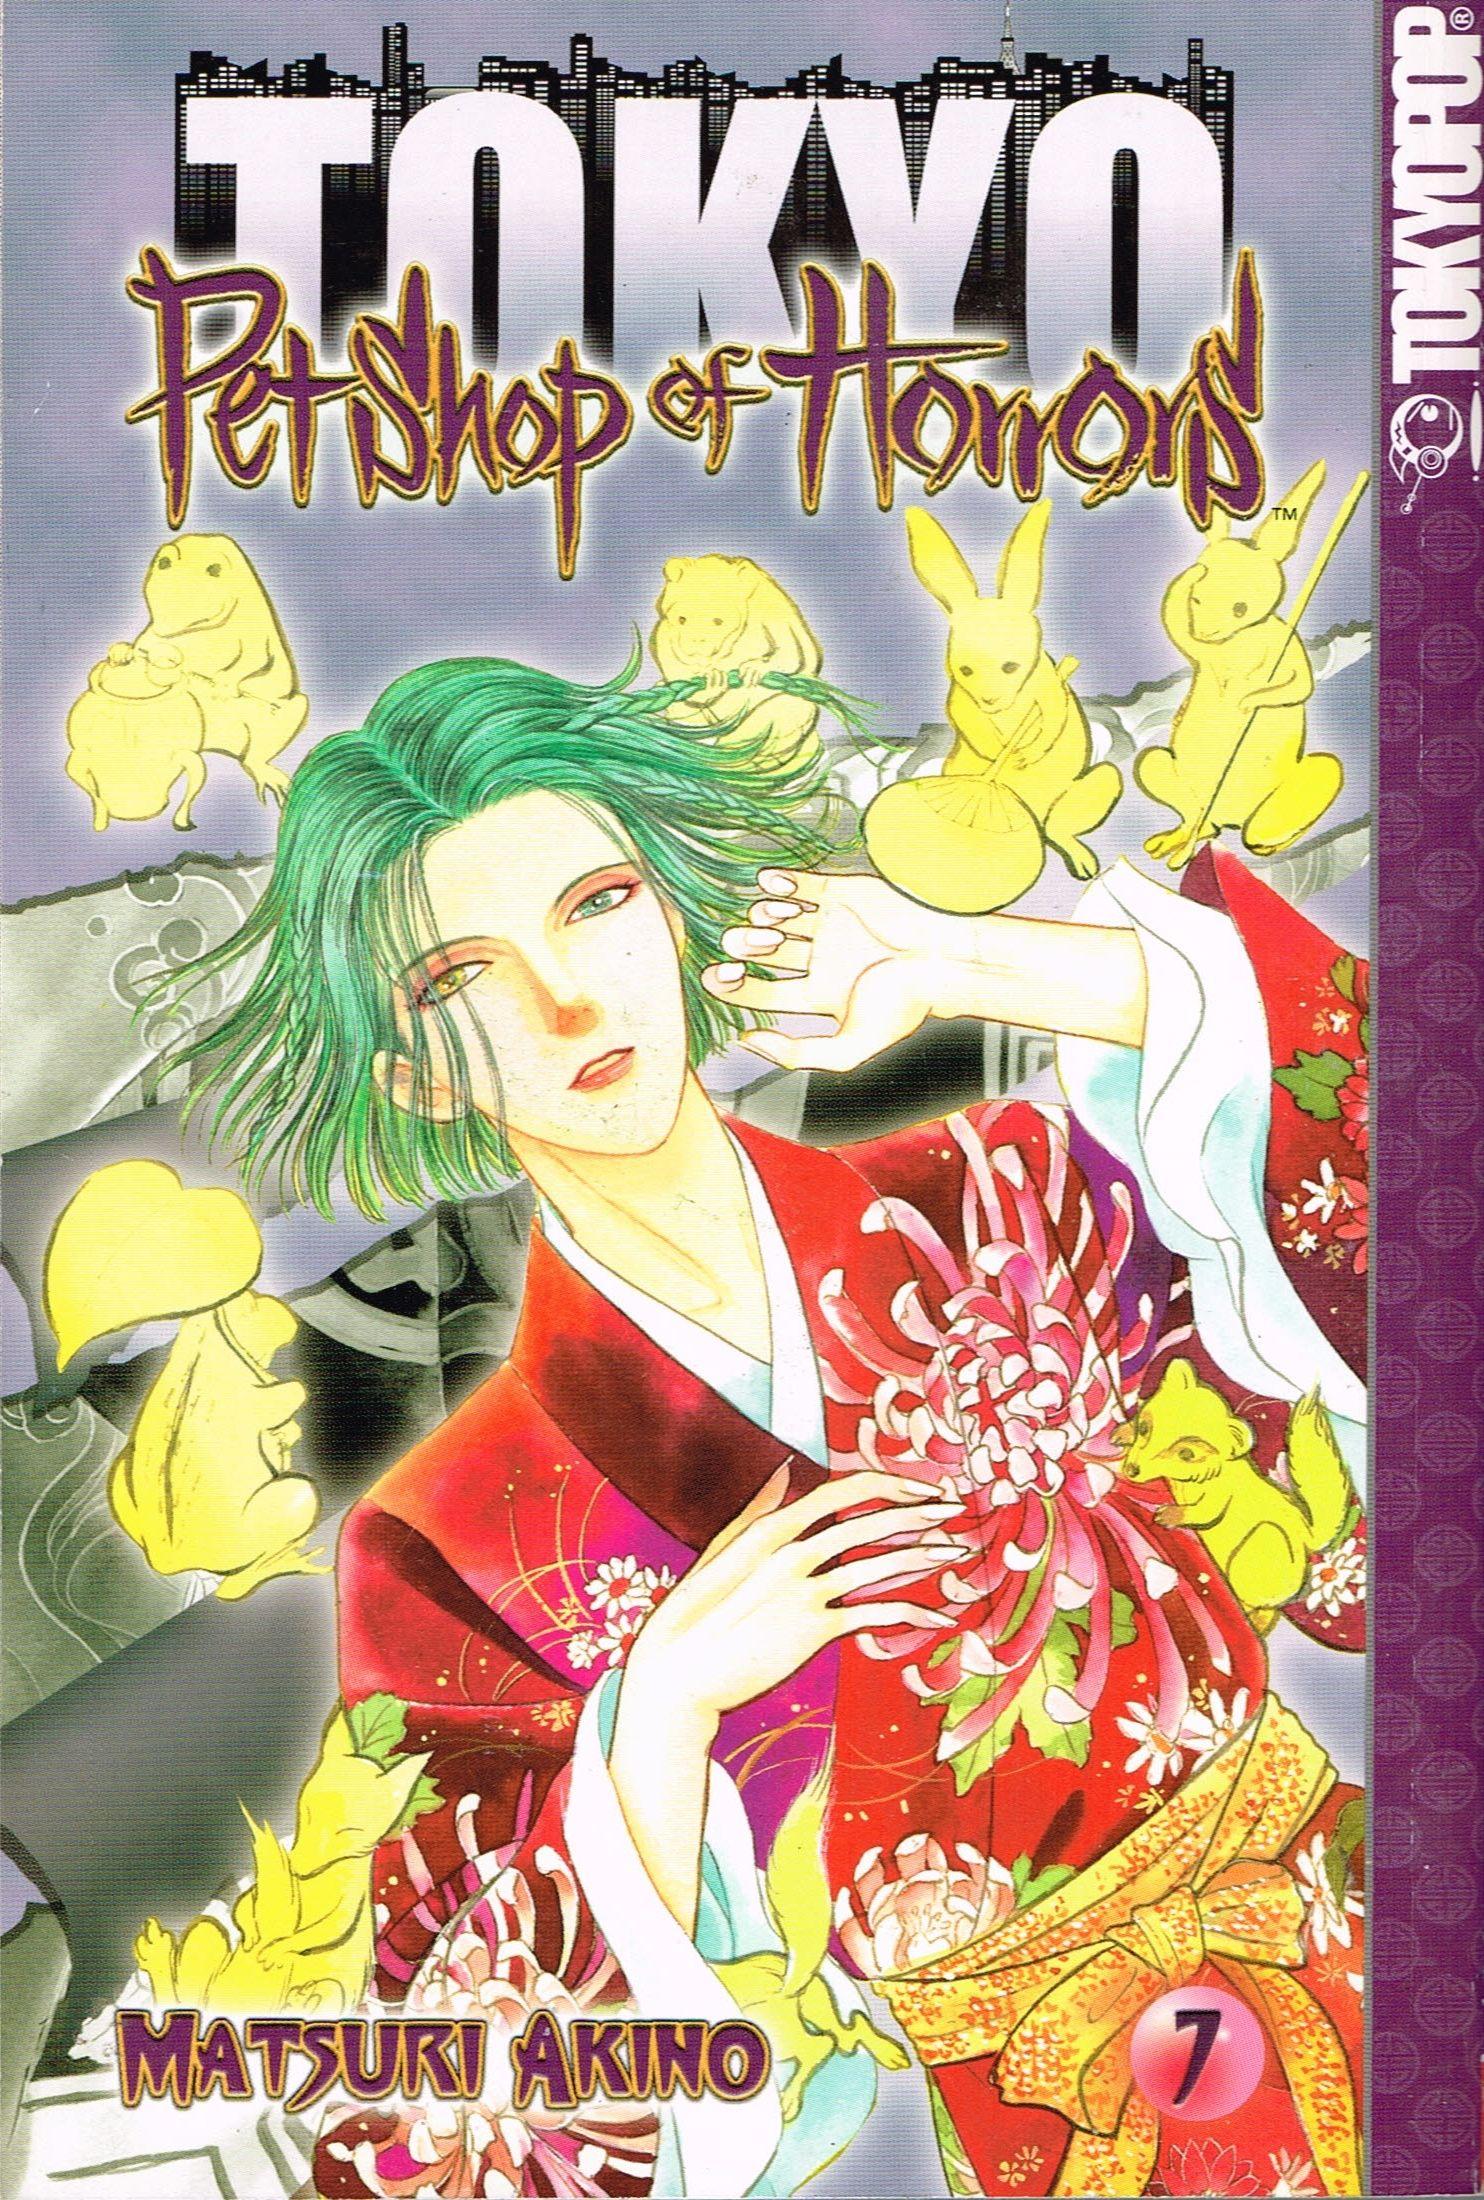 Petshop Of Horrors Tokyo Vol 7 2010 By Matsuri Akino Finihsed 21st Oct 2016 Pet Shop Graphic Novel Cover Horror